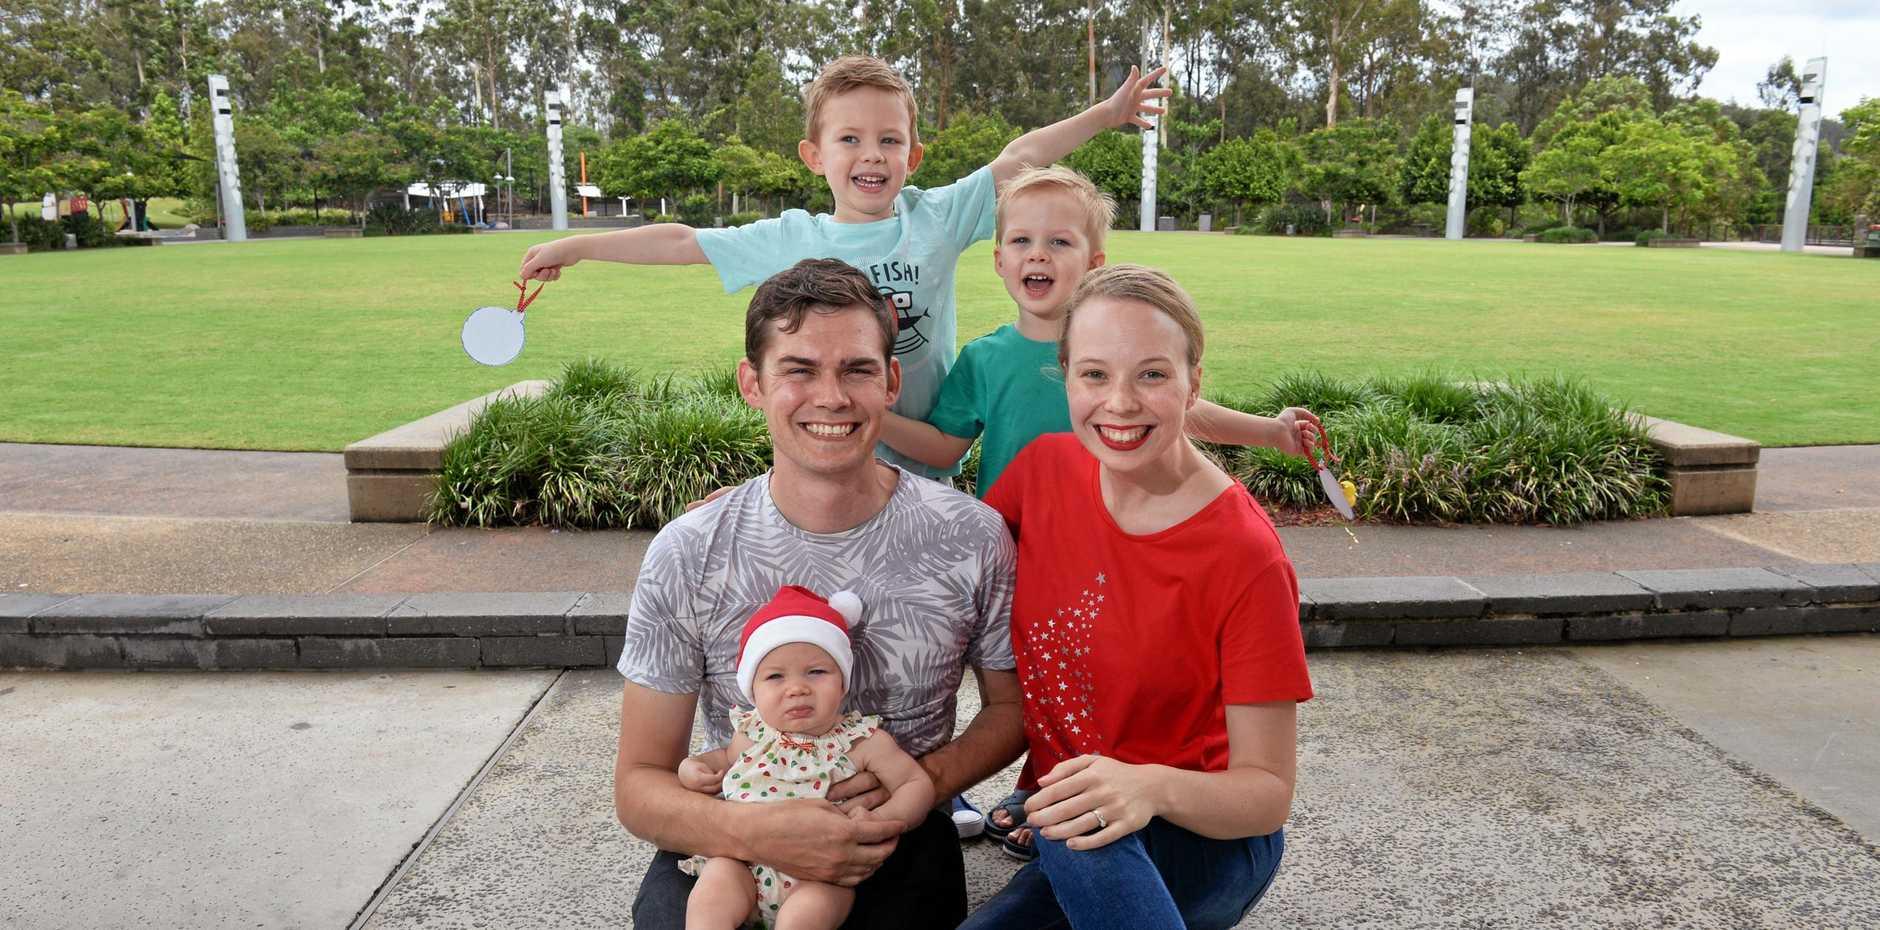 Anthony and Rebekah Sligar enjoy attending the Robelle Domain Christmas Carols with their children Caleb (back left), Zeke, and baby Harper.